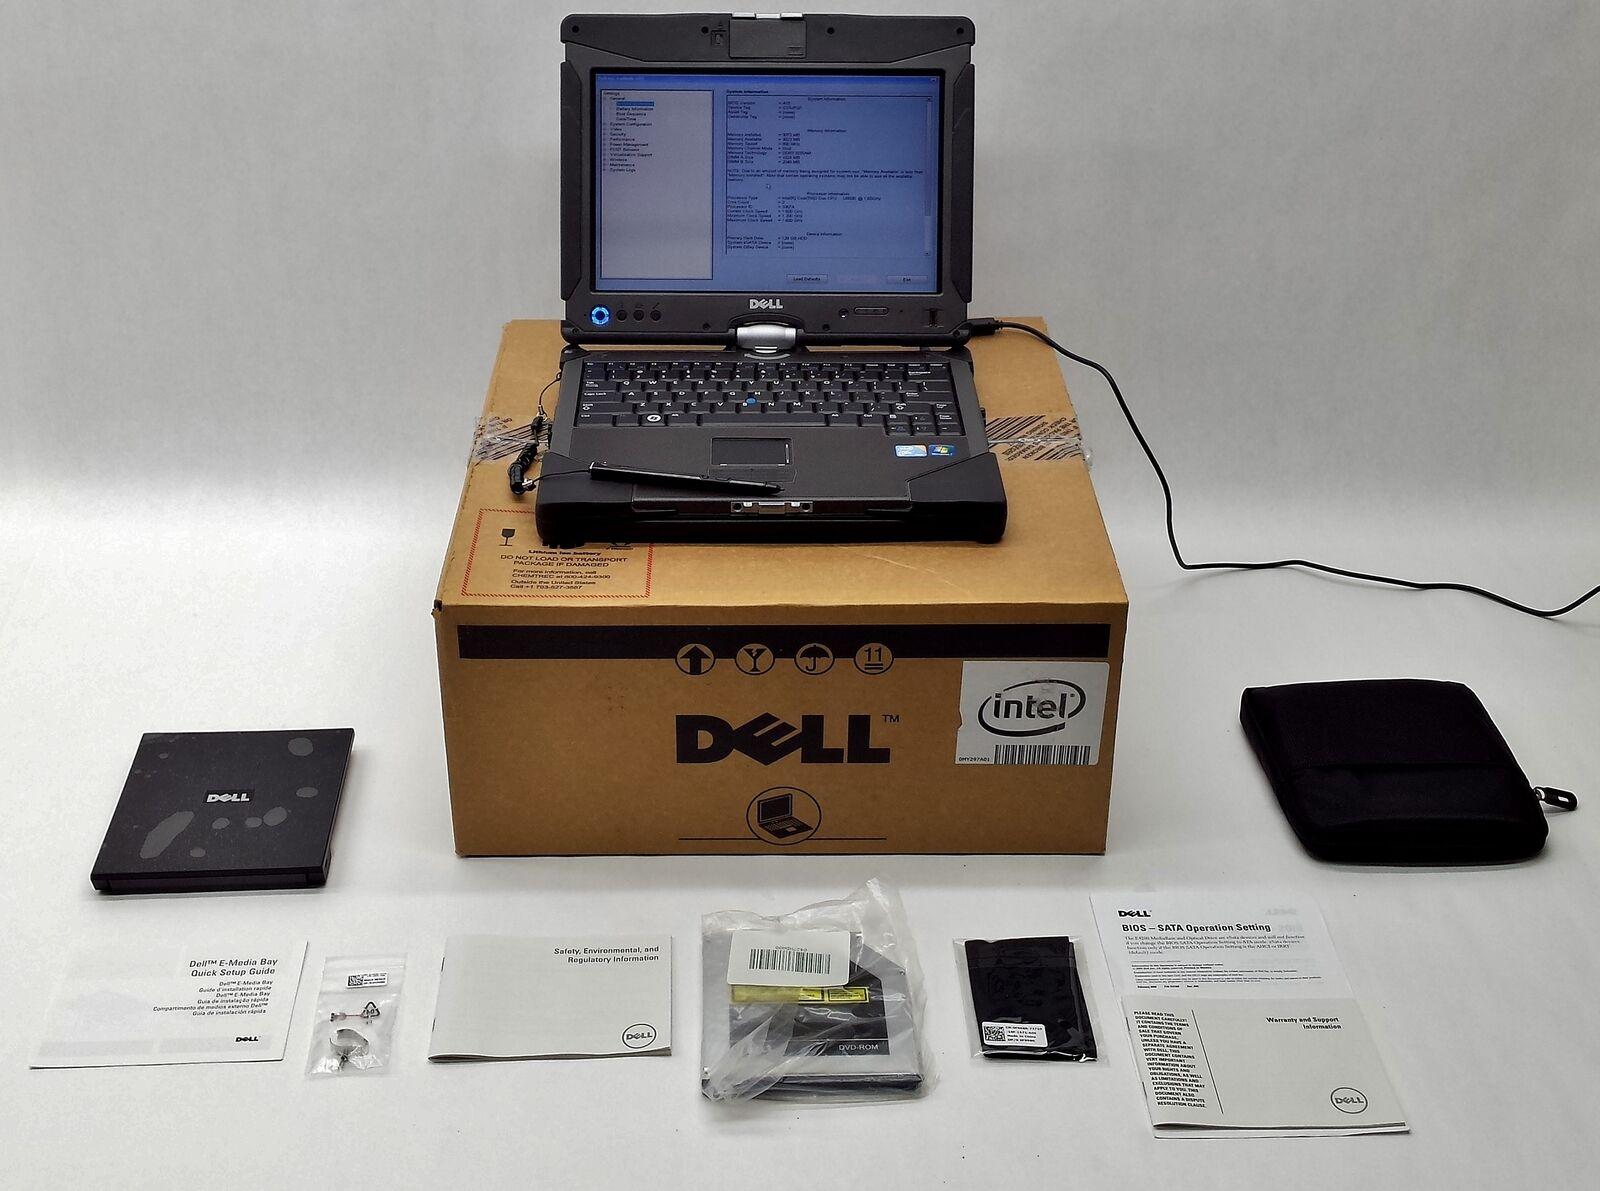 "Dell Latitude XT2 XFR 12"" CORE 2 DUO U9600 1.60GHz 3GB 128GB SSD LAPTOP TABLET"